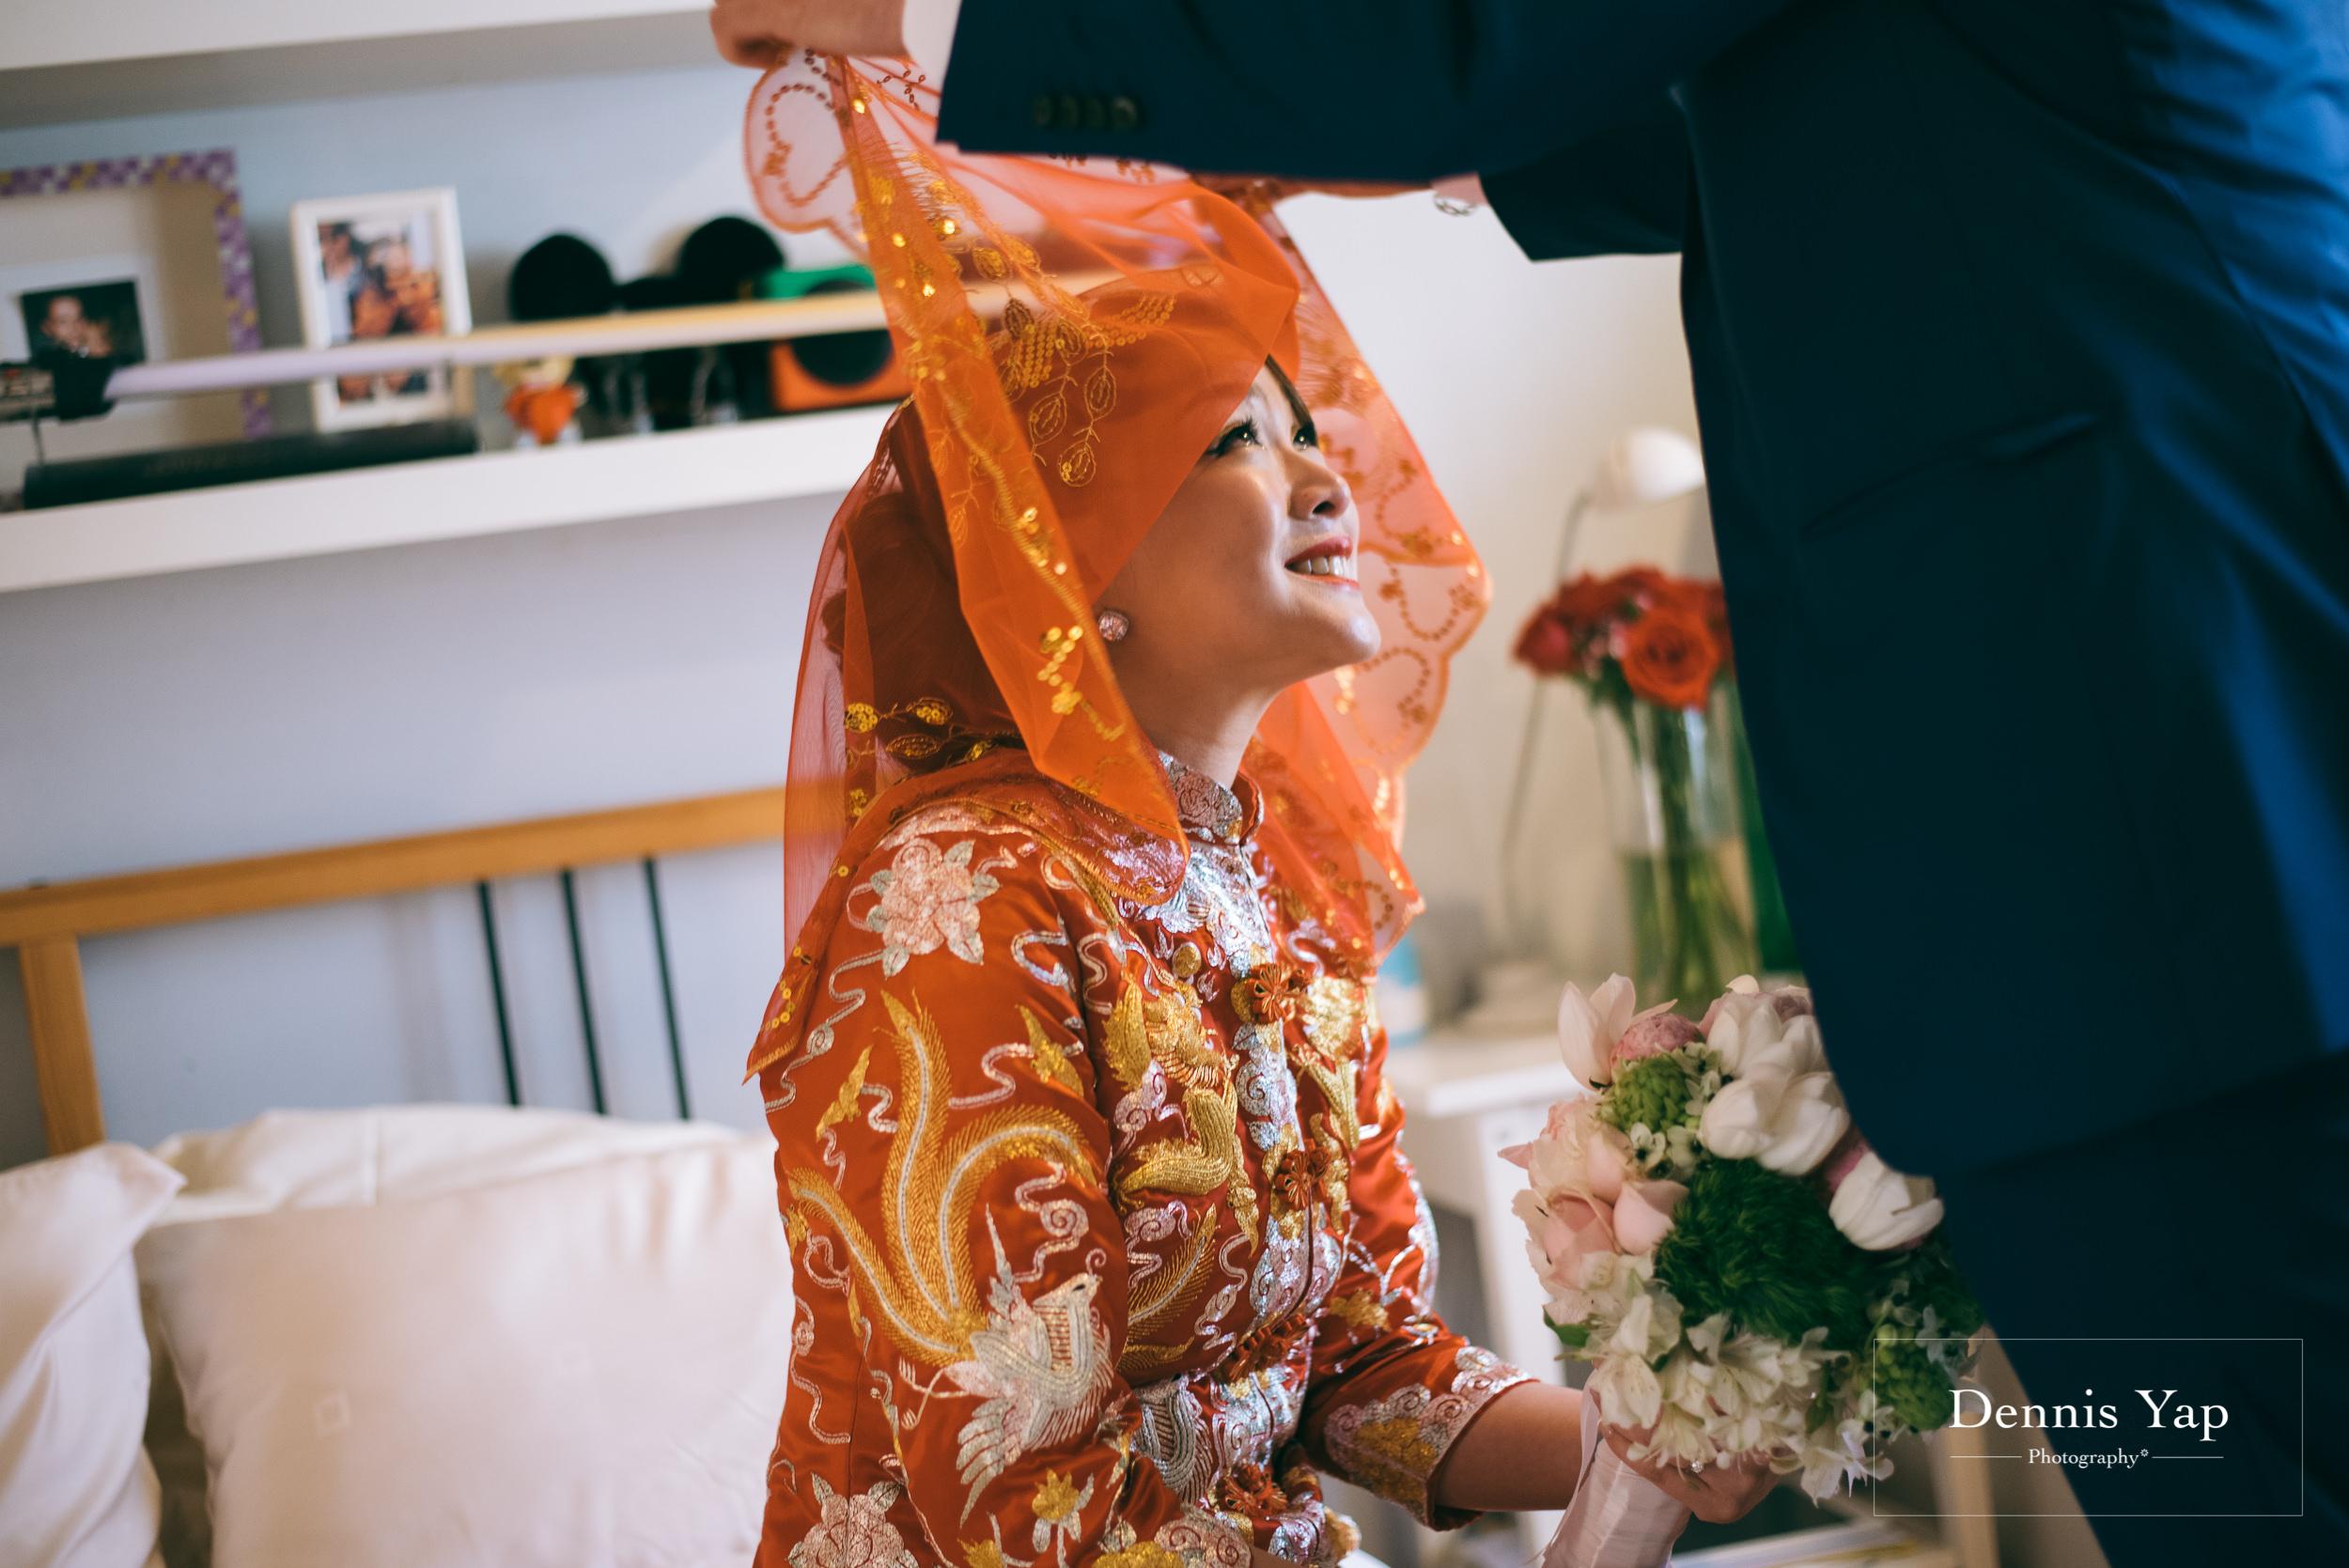 jordan amanda wedding day westin hotel kuala lumpur choe family dennis yap photography-11.jpg